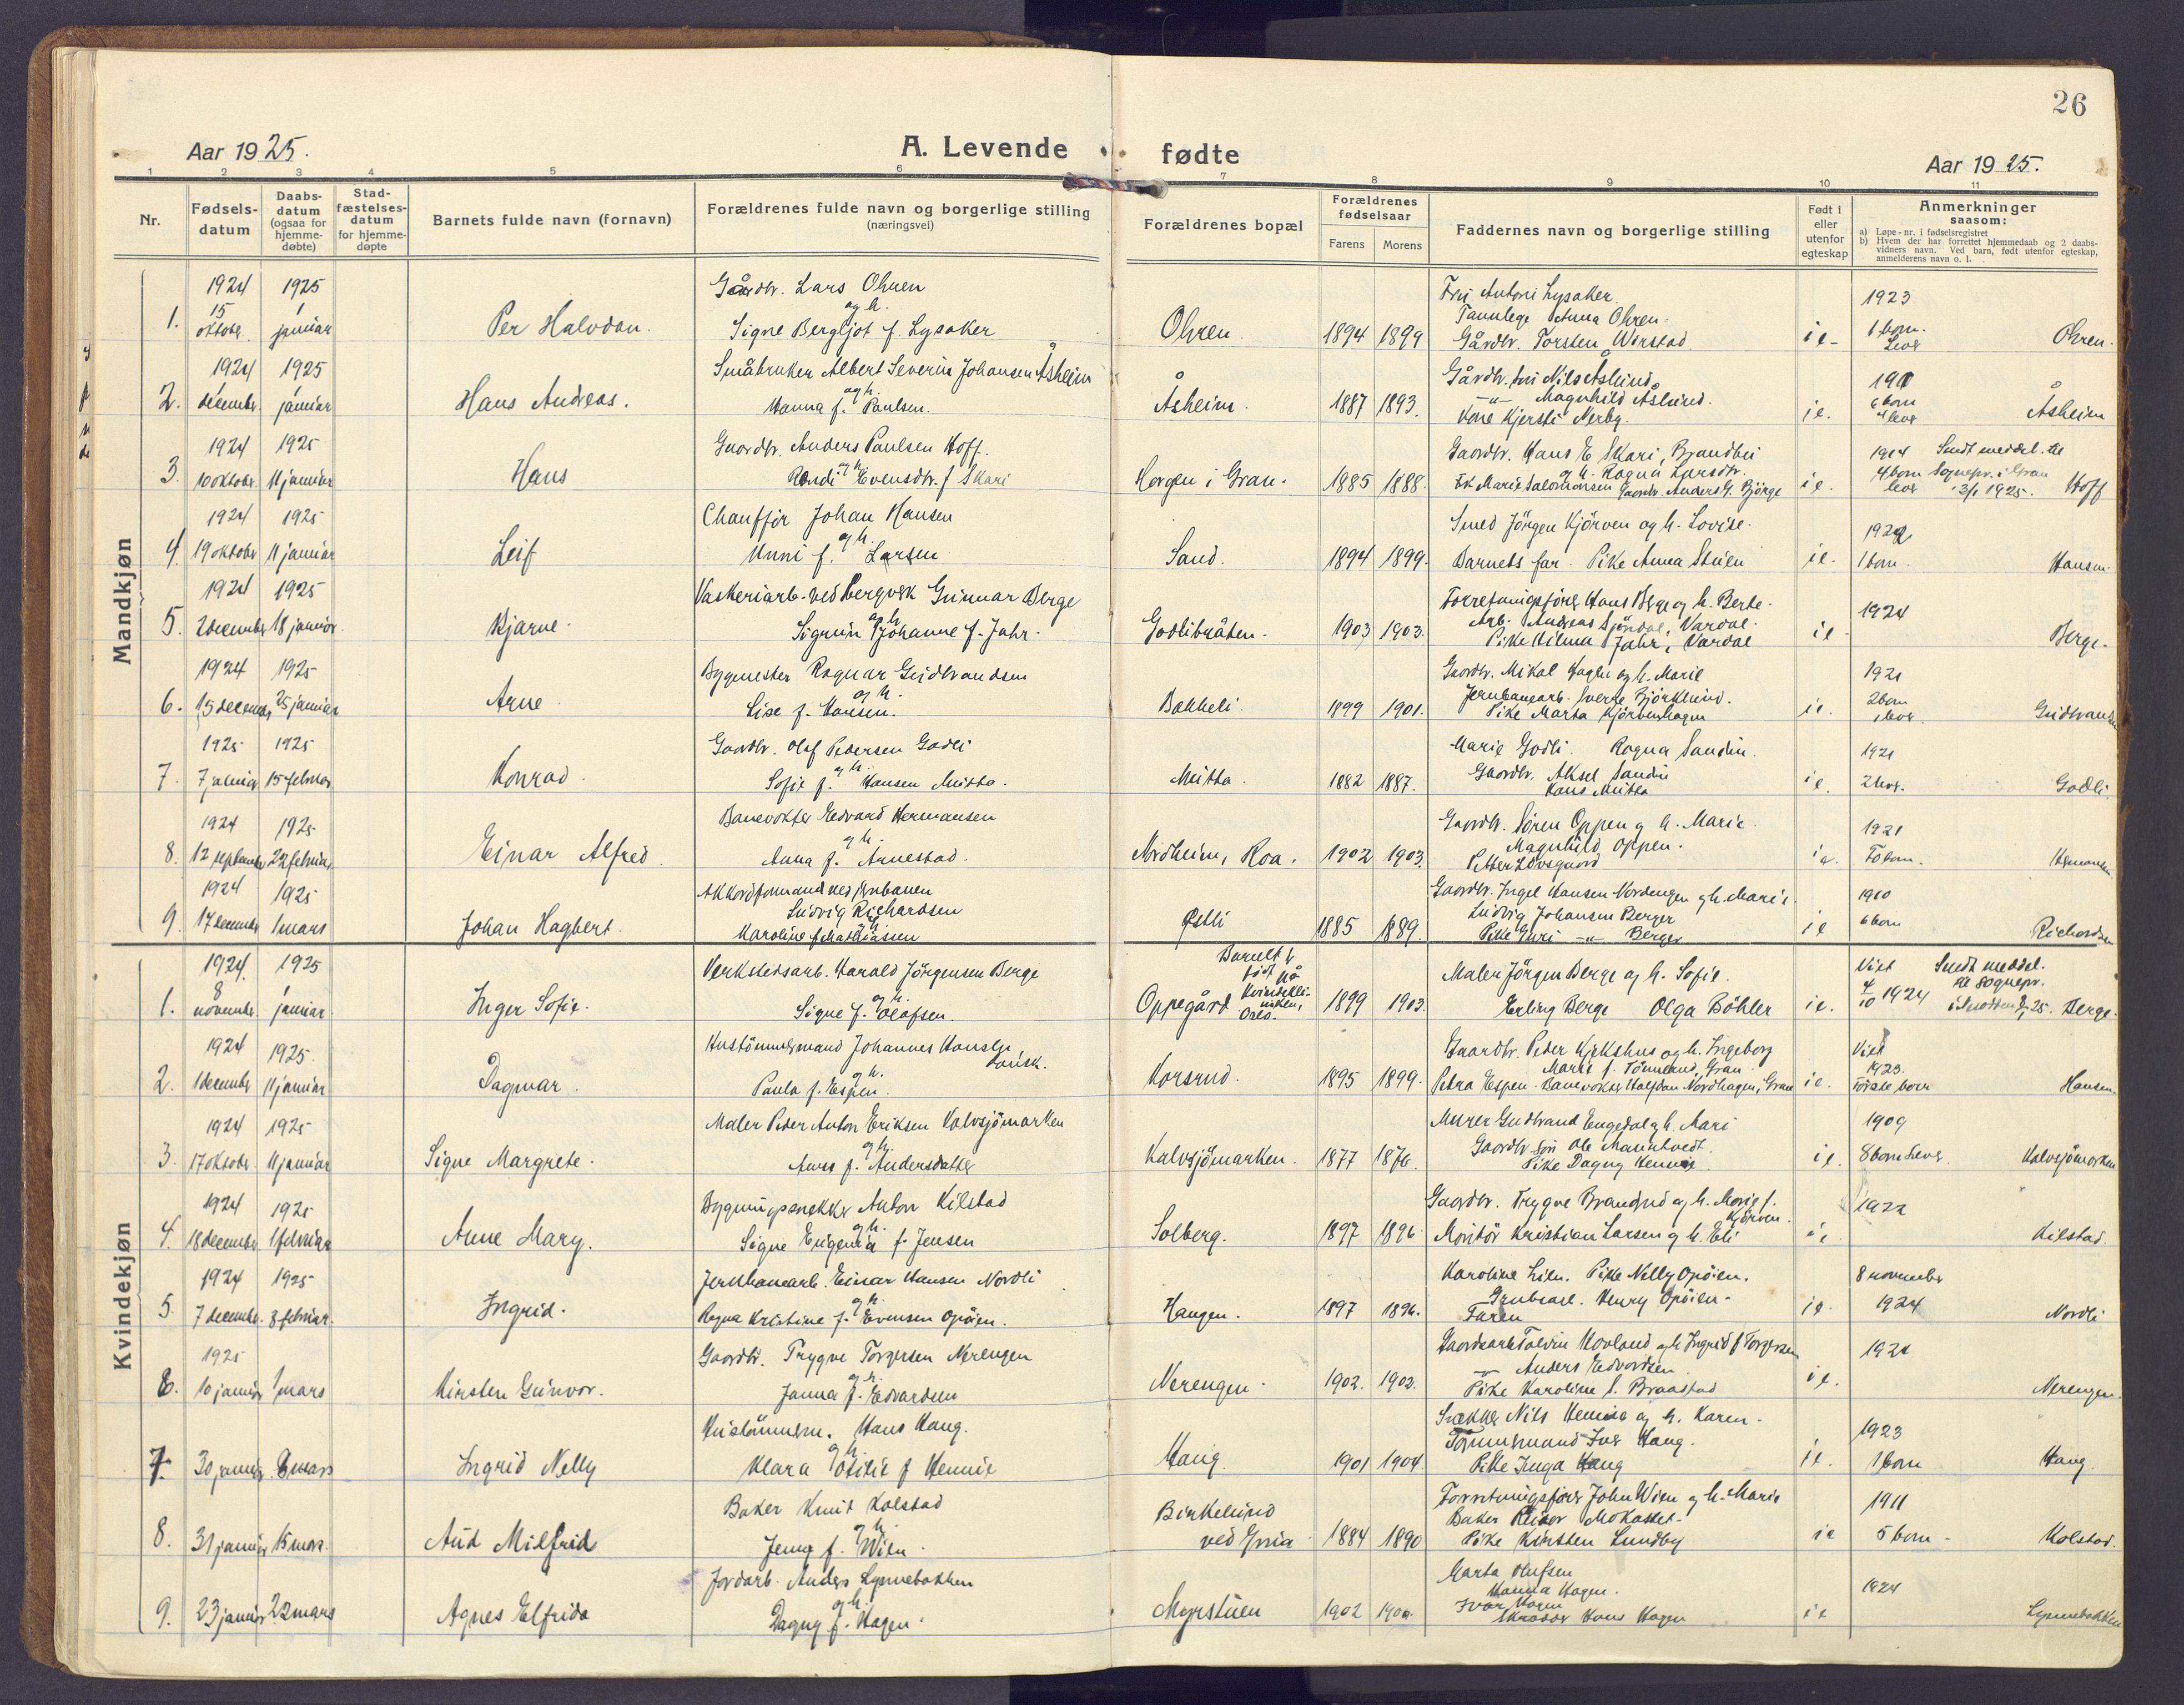 SAH, Lunner prestekontor, H/Ha/Haa/L0002: Ministerialbok nr. 2, 1922-1931, s. 26